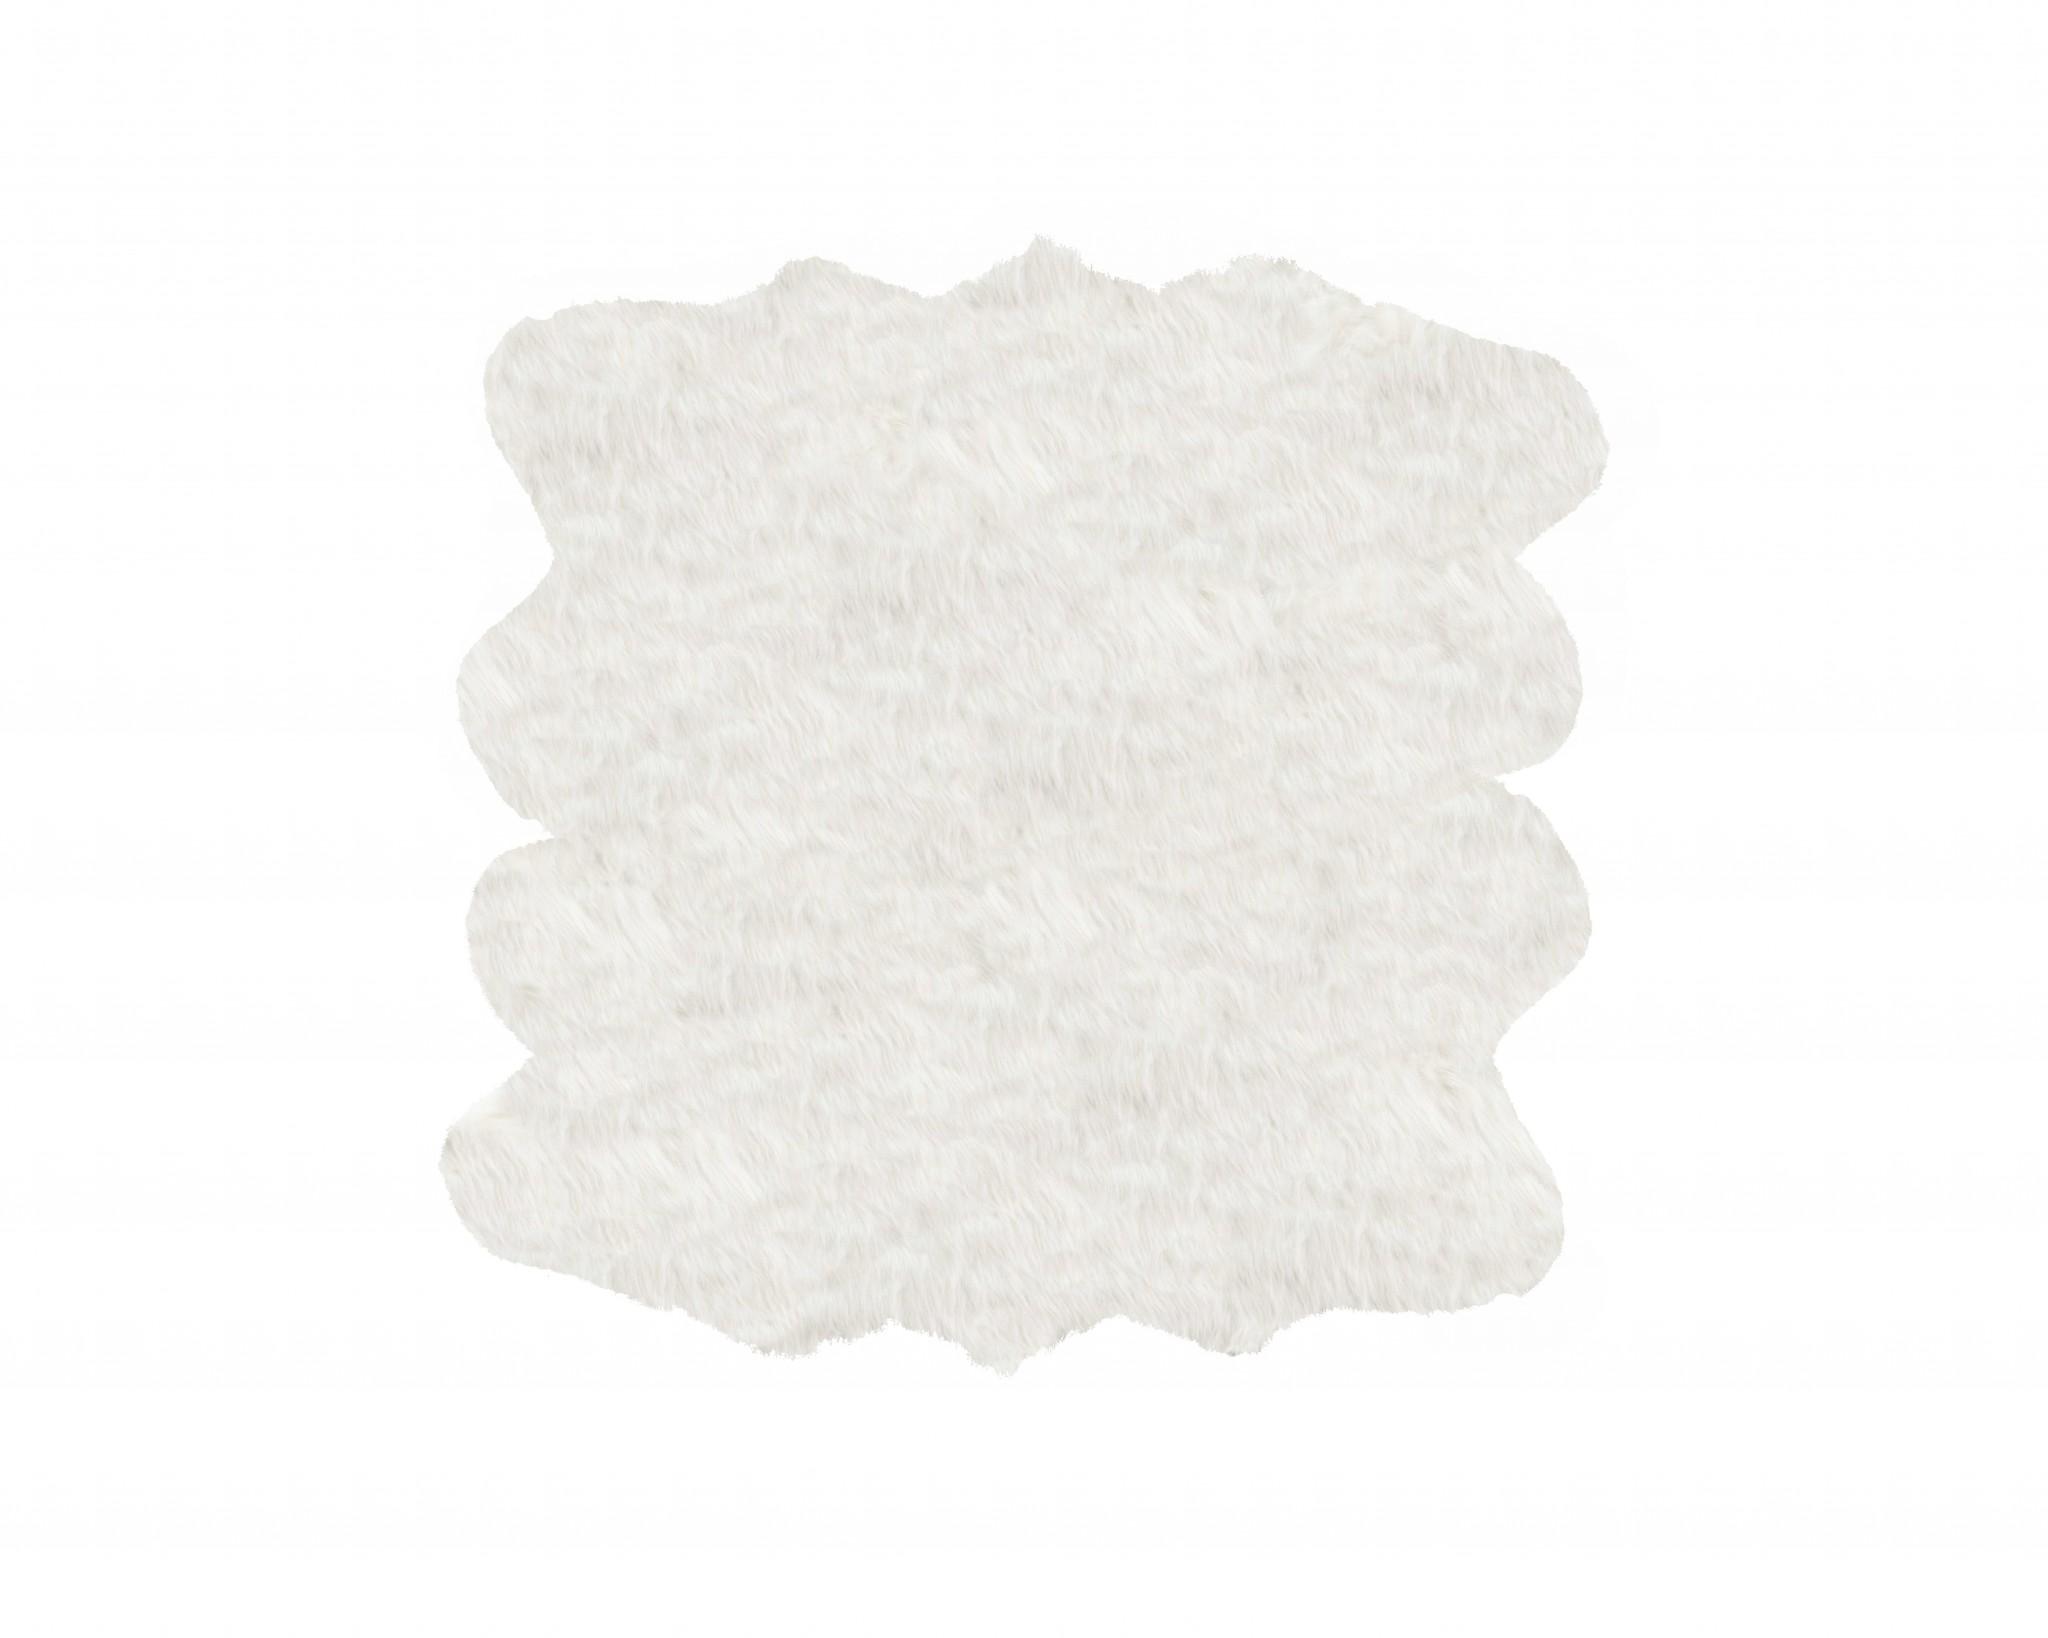 5' X 6' X 1.5' Off White Octo Faux Sheepskin Area Rug